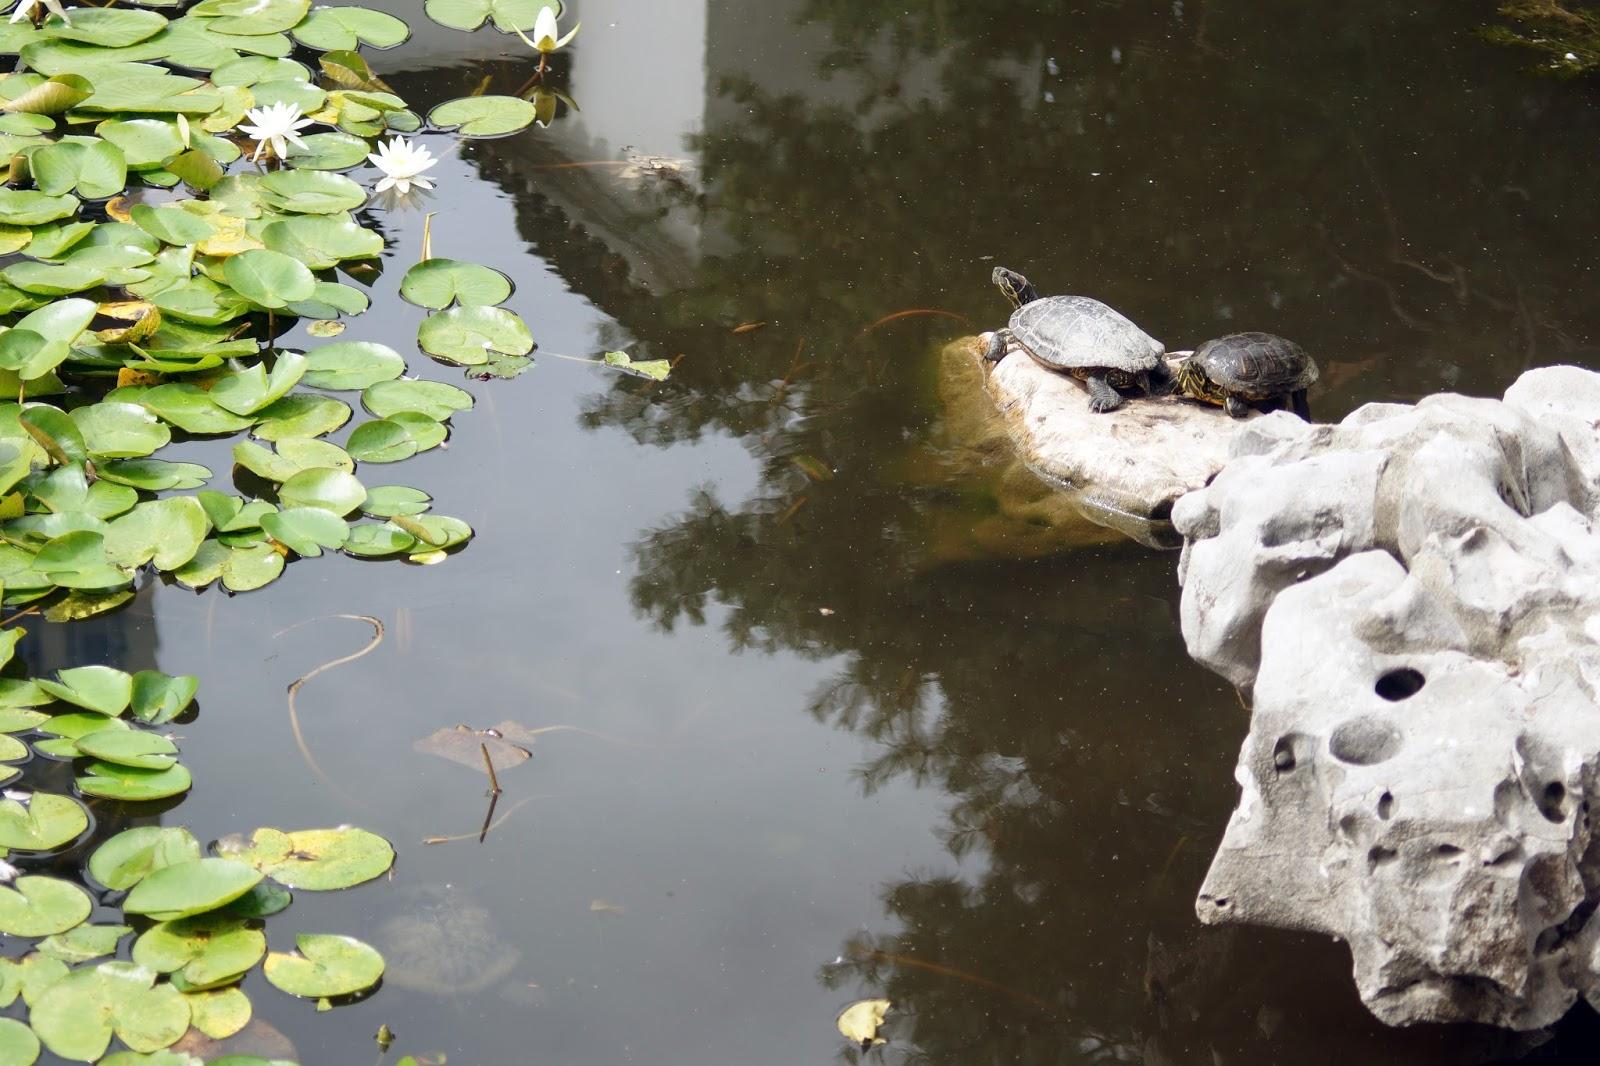 Continually Surprised!: The Sun Yat-Sen Chinese Garden